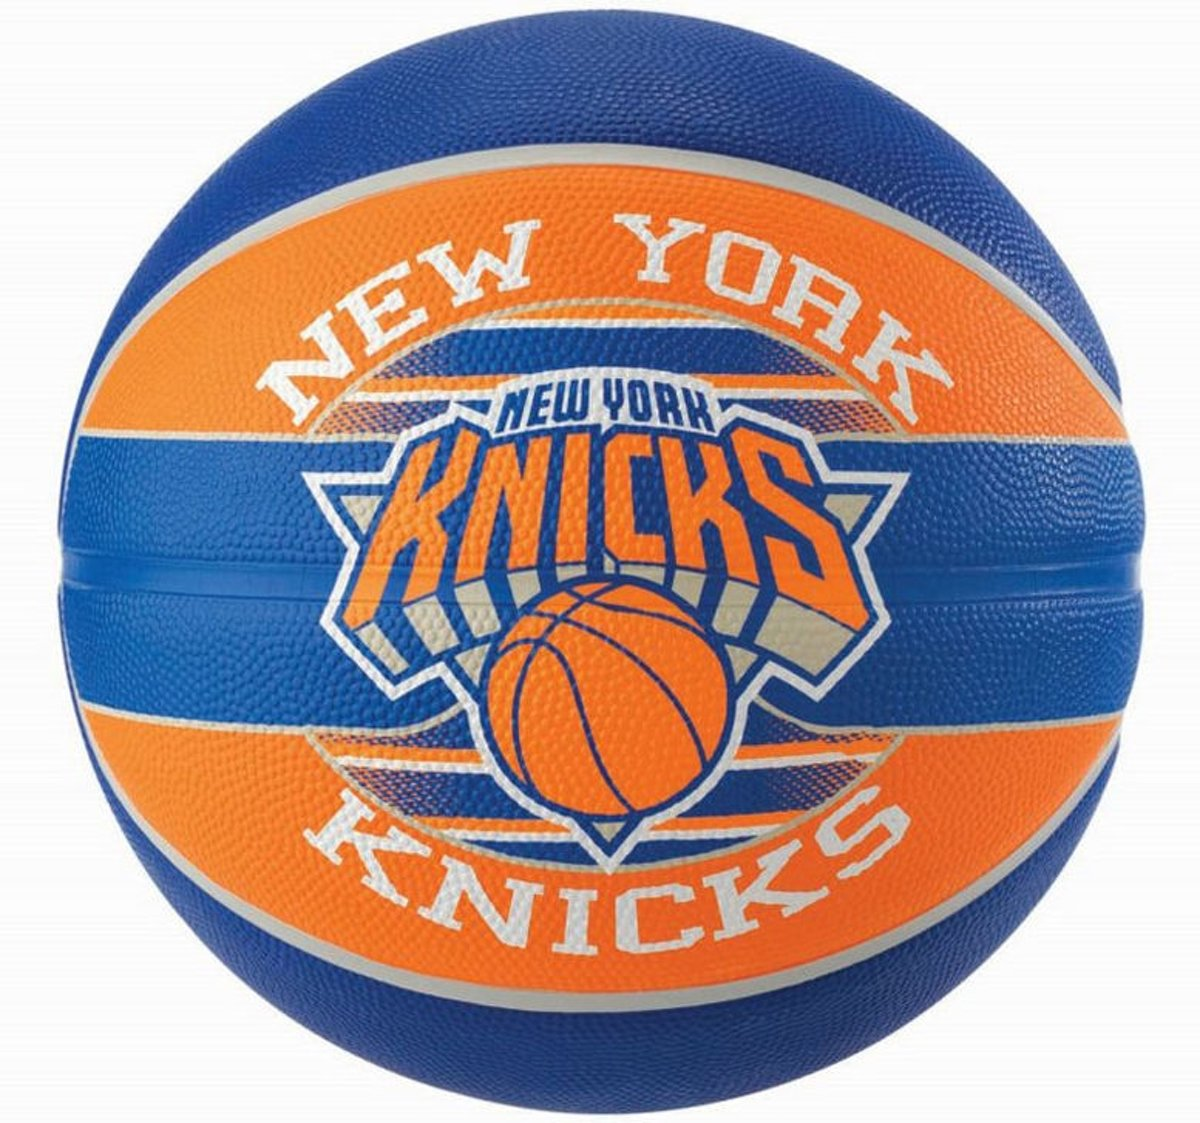 Spalding Basketballen NBA-team ny knicks Sc.7 (83-509z) kopen